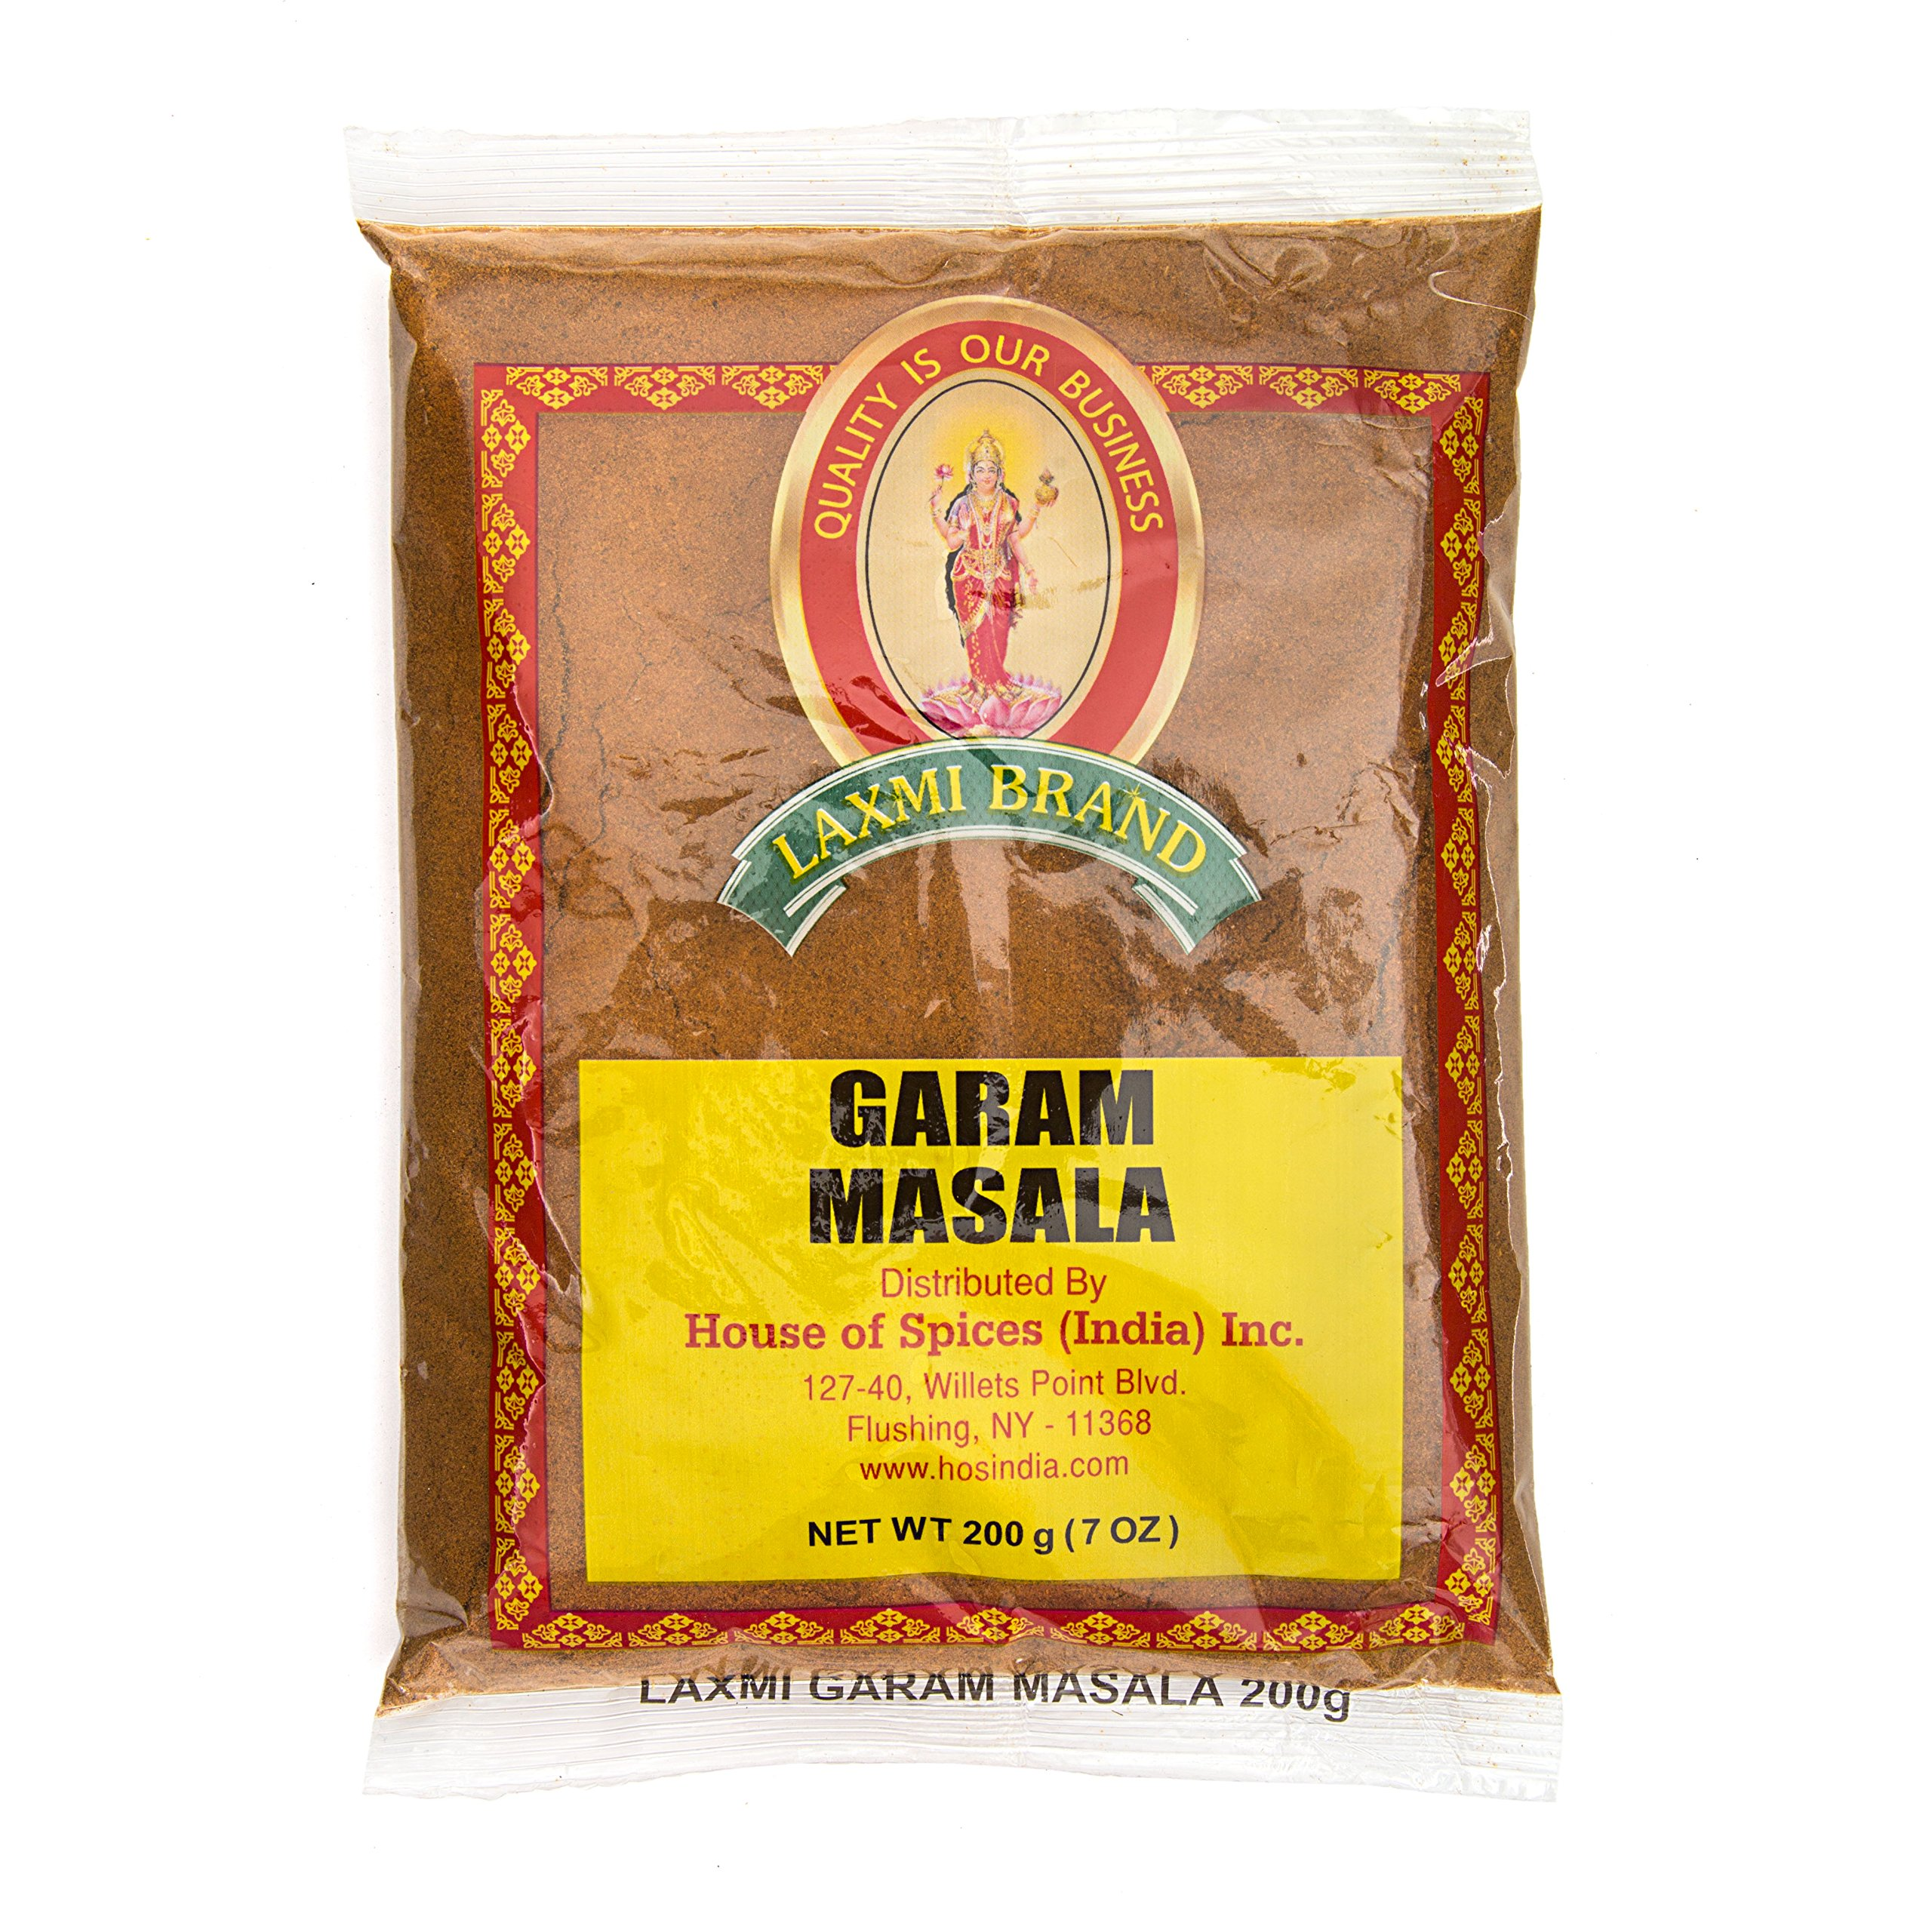 Laxmi Gourmet Traditional Garam Masala Indian Spice Blend - (20, 7oz Packets)